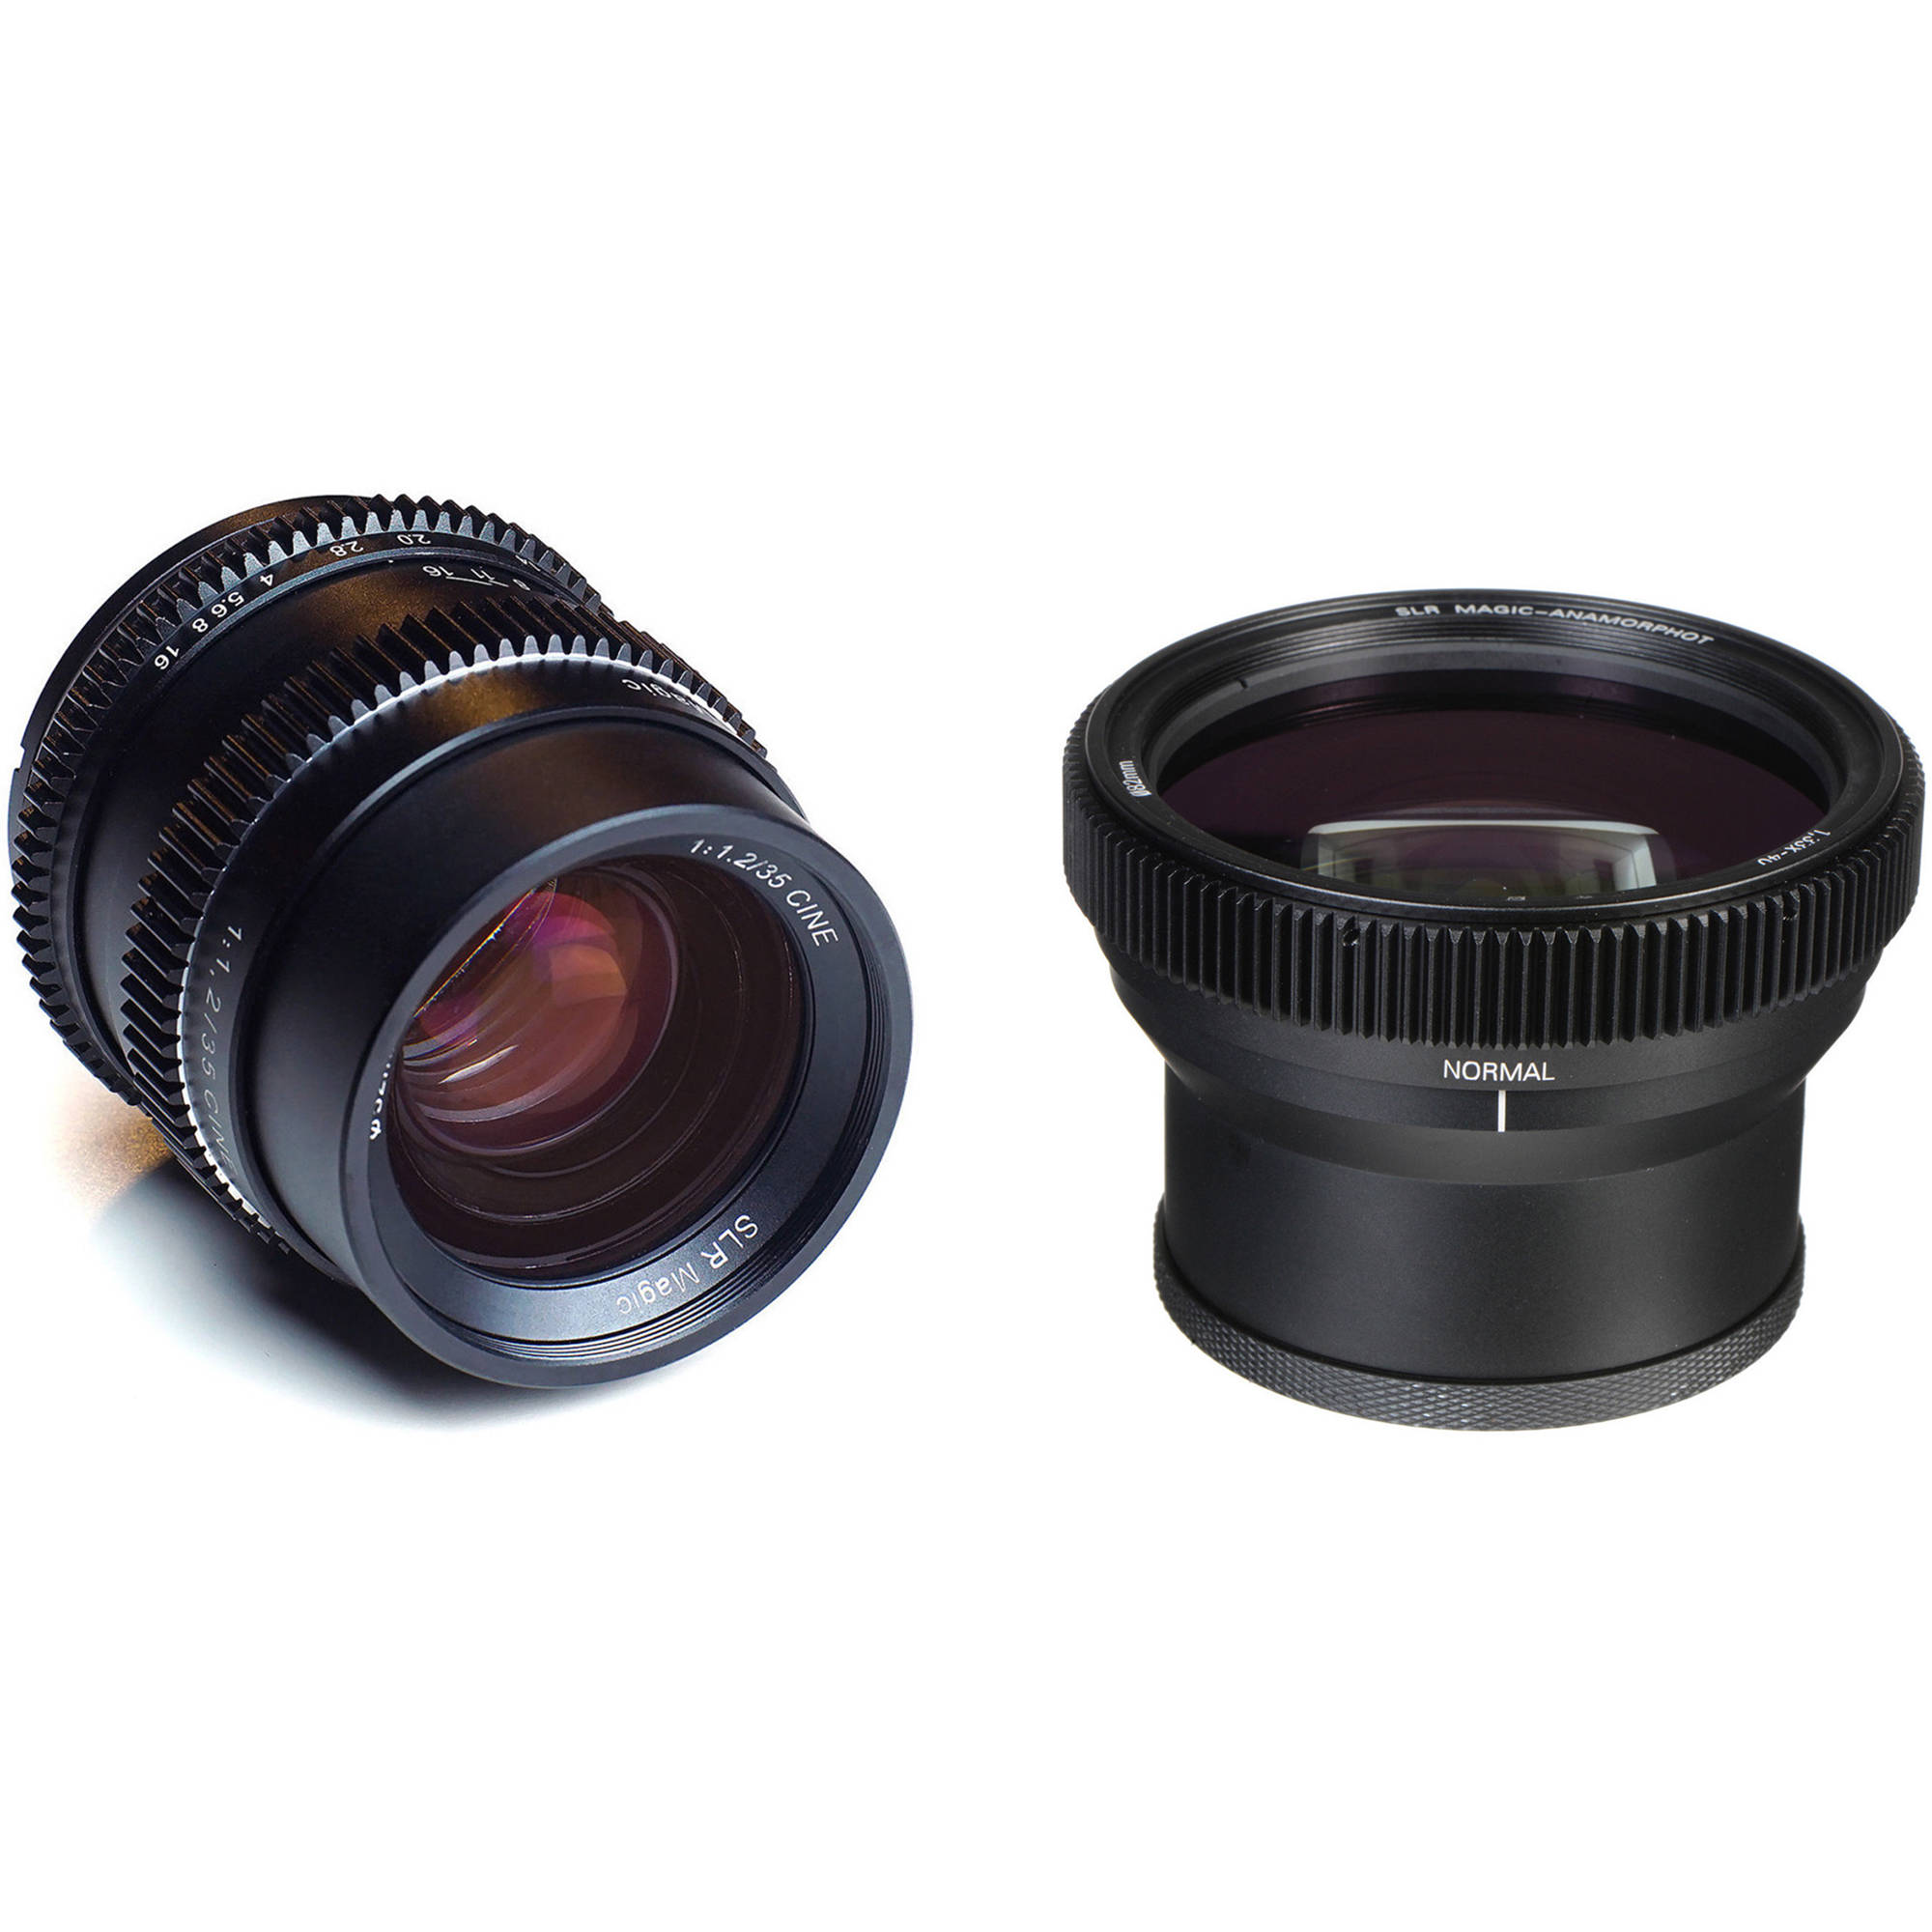 SLR Magic Cine 35mm f/1 2 FE Lens and Anamorphot-40 1 33x Anamorphic  Adapter Kit (E-Mount)